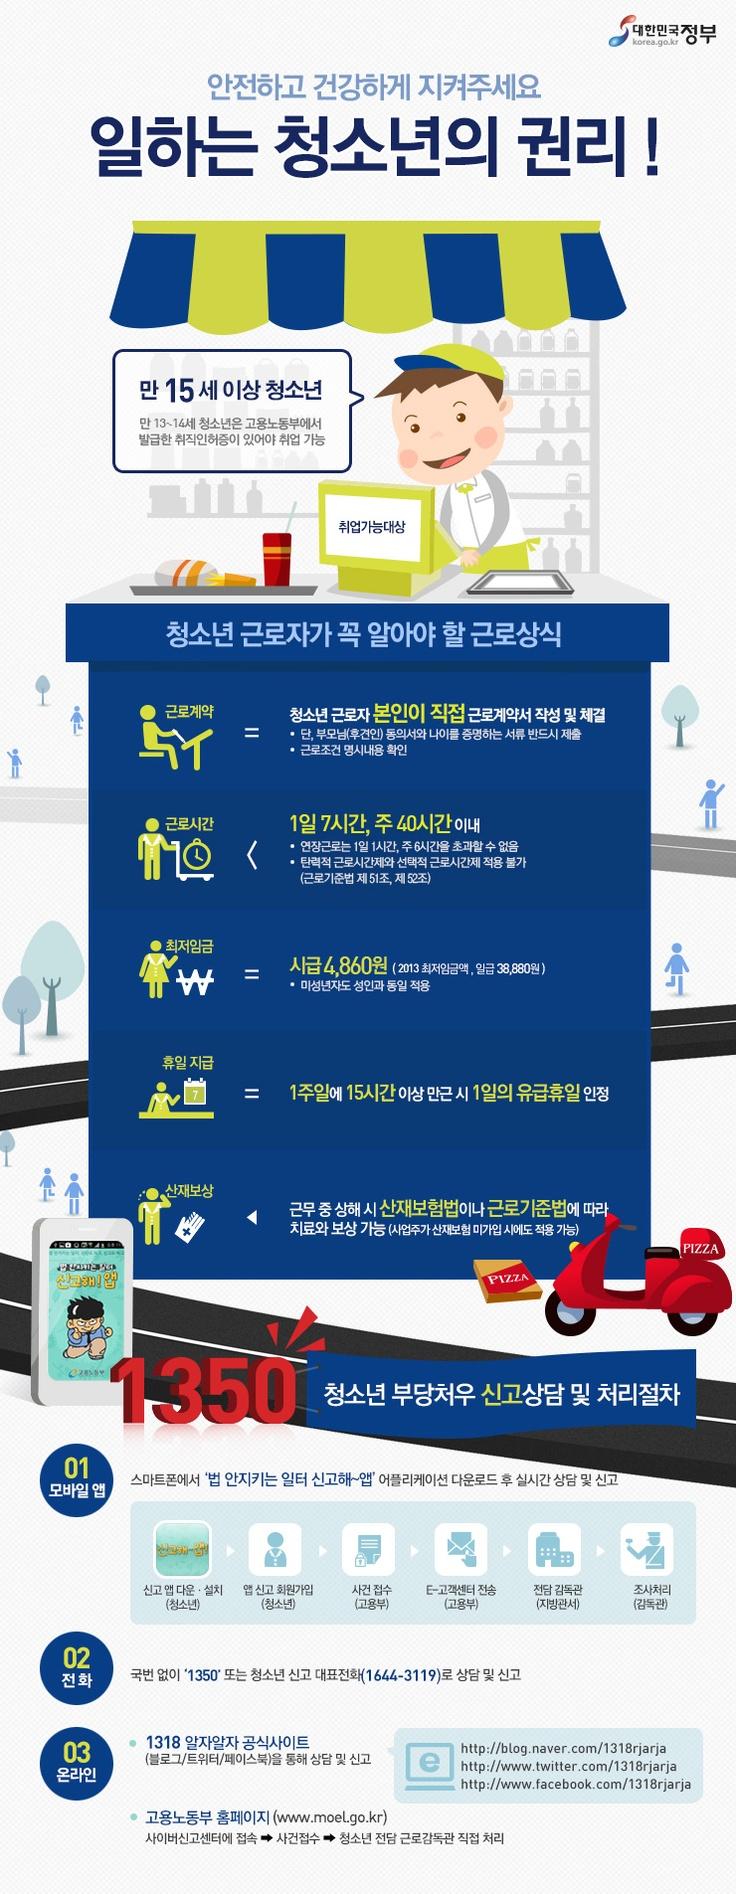 [Infographic] '아이들을 지켜주세요!' 일하는 청소년의 권리에 관한 인포그래픽